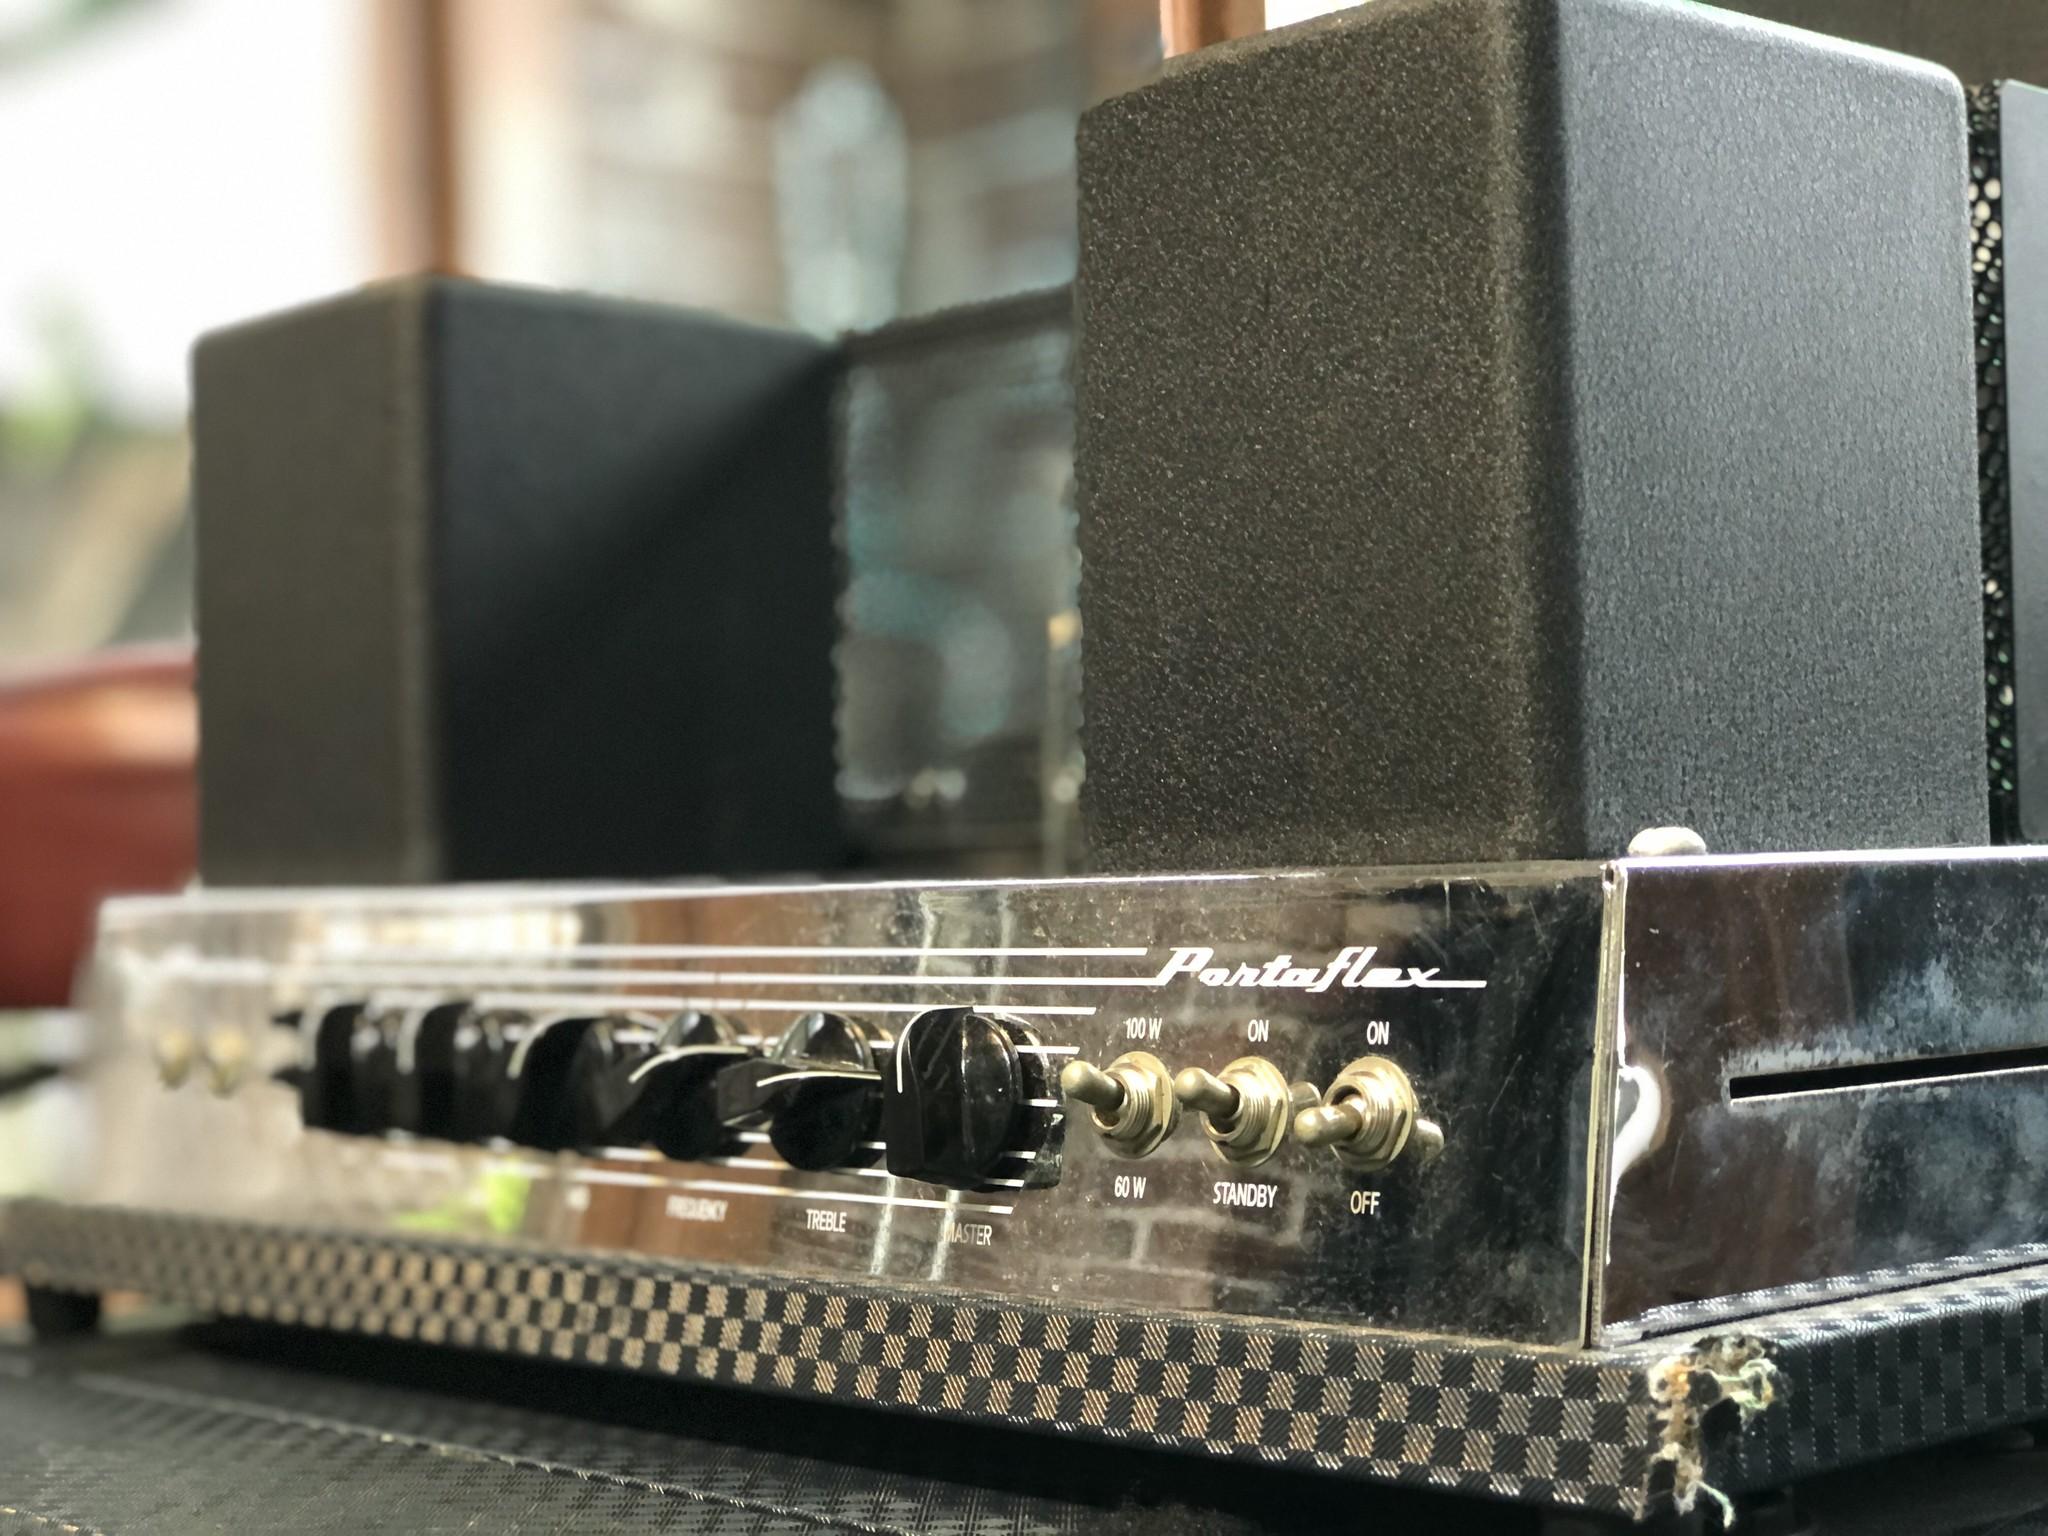 Ampeg B-15R Portaflex Amp and Cabinet-2